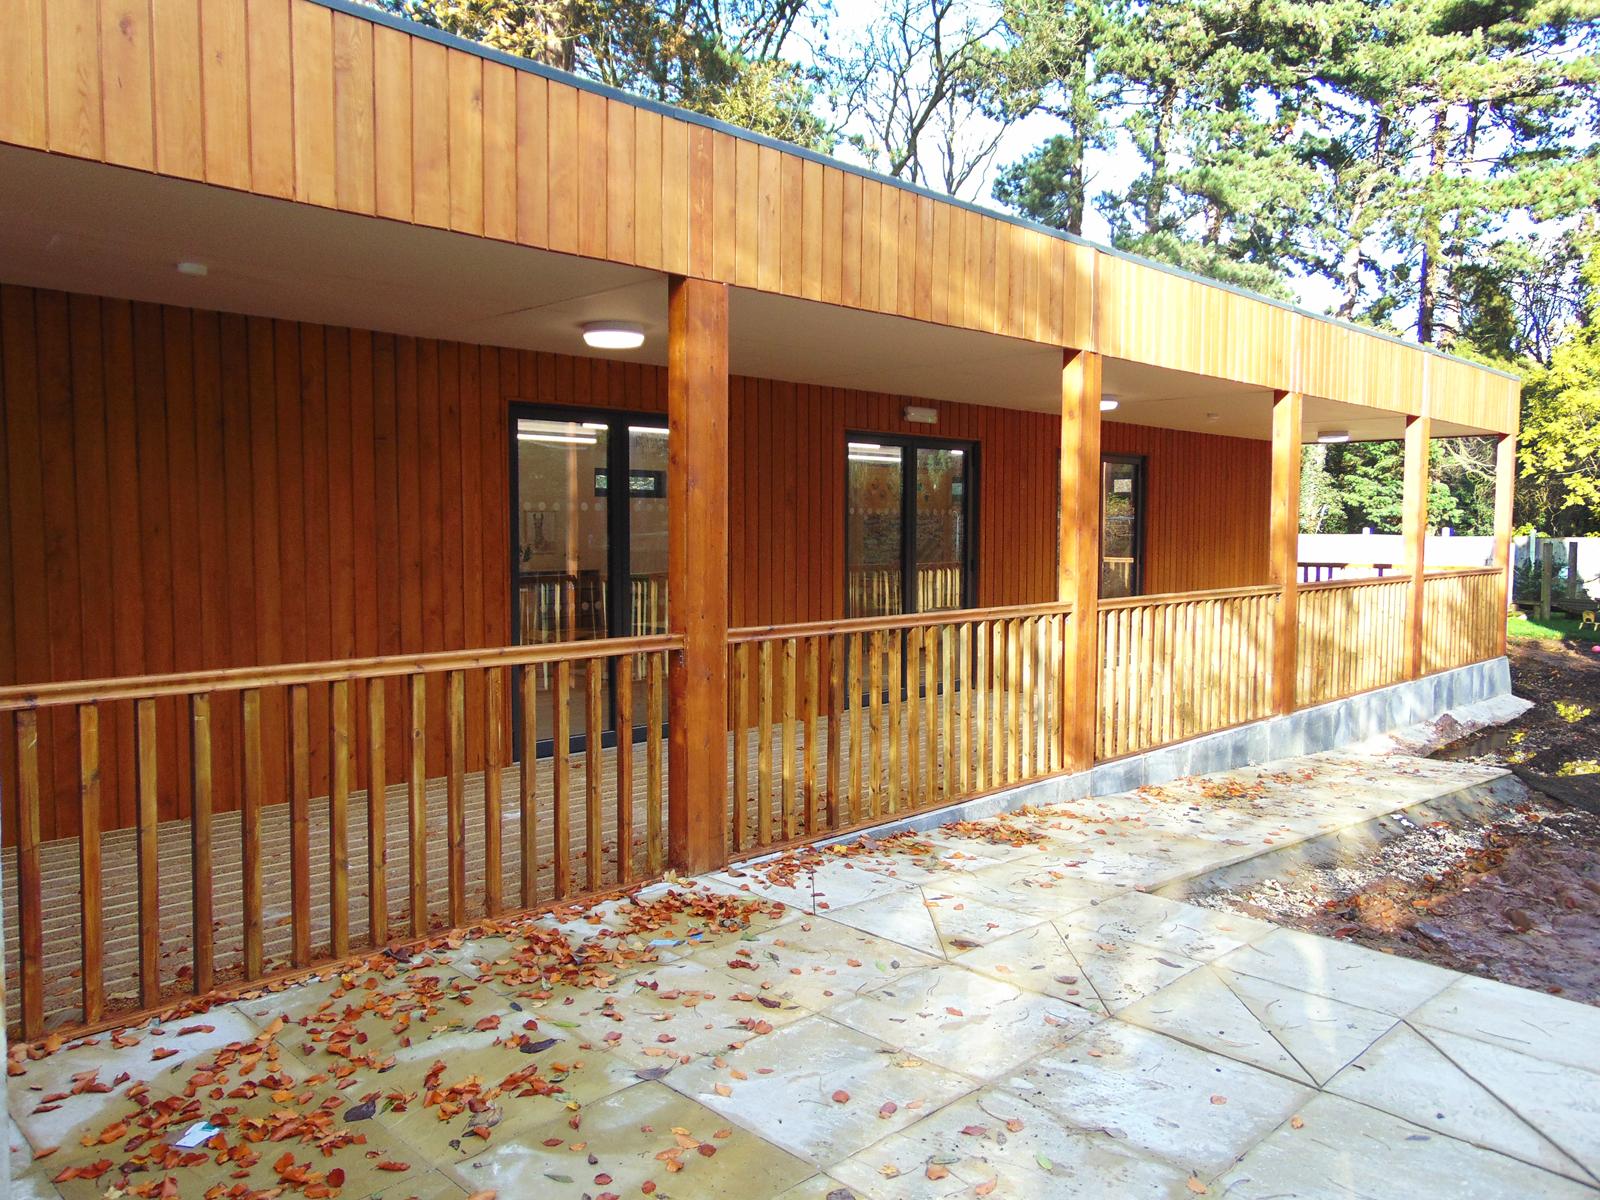 Modular Nursery Exterior